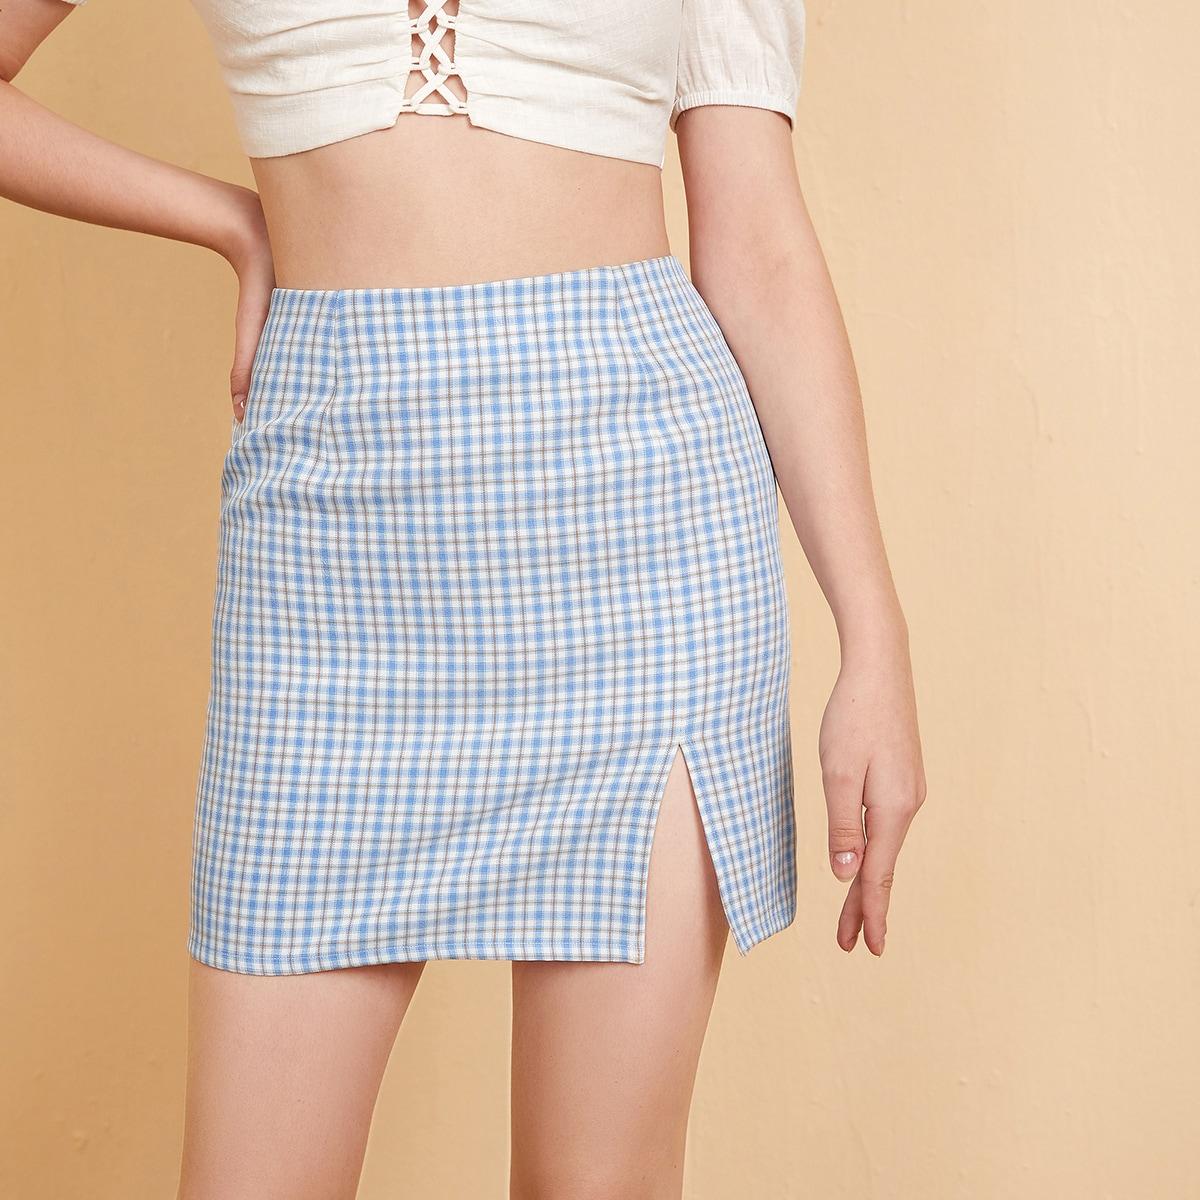 SHEIN / Zipper Side Split Hem Plaid Skirt